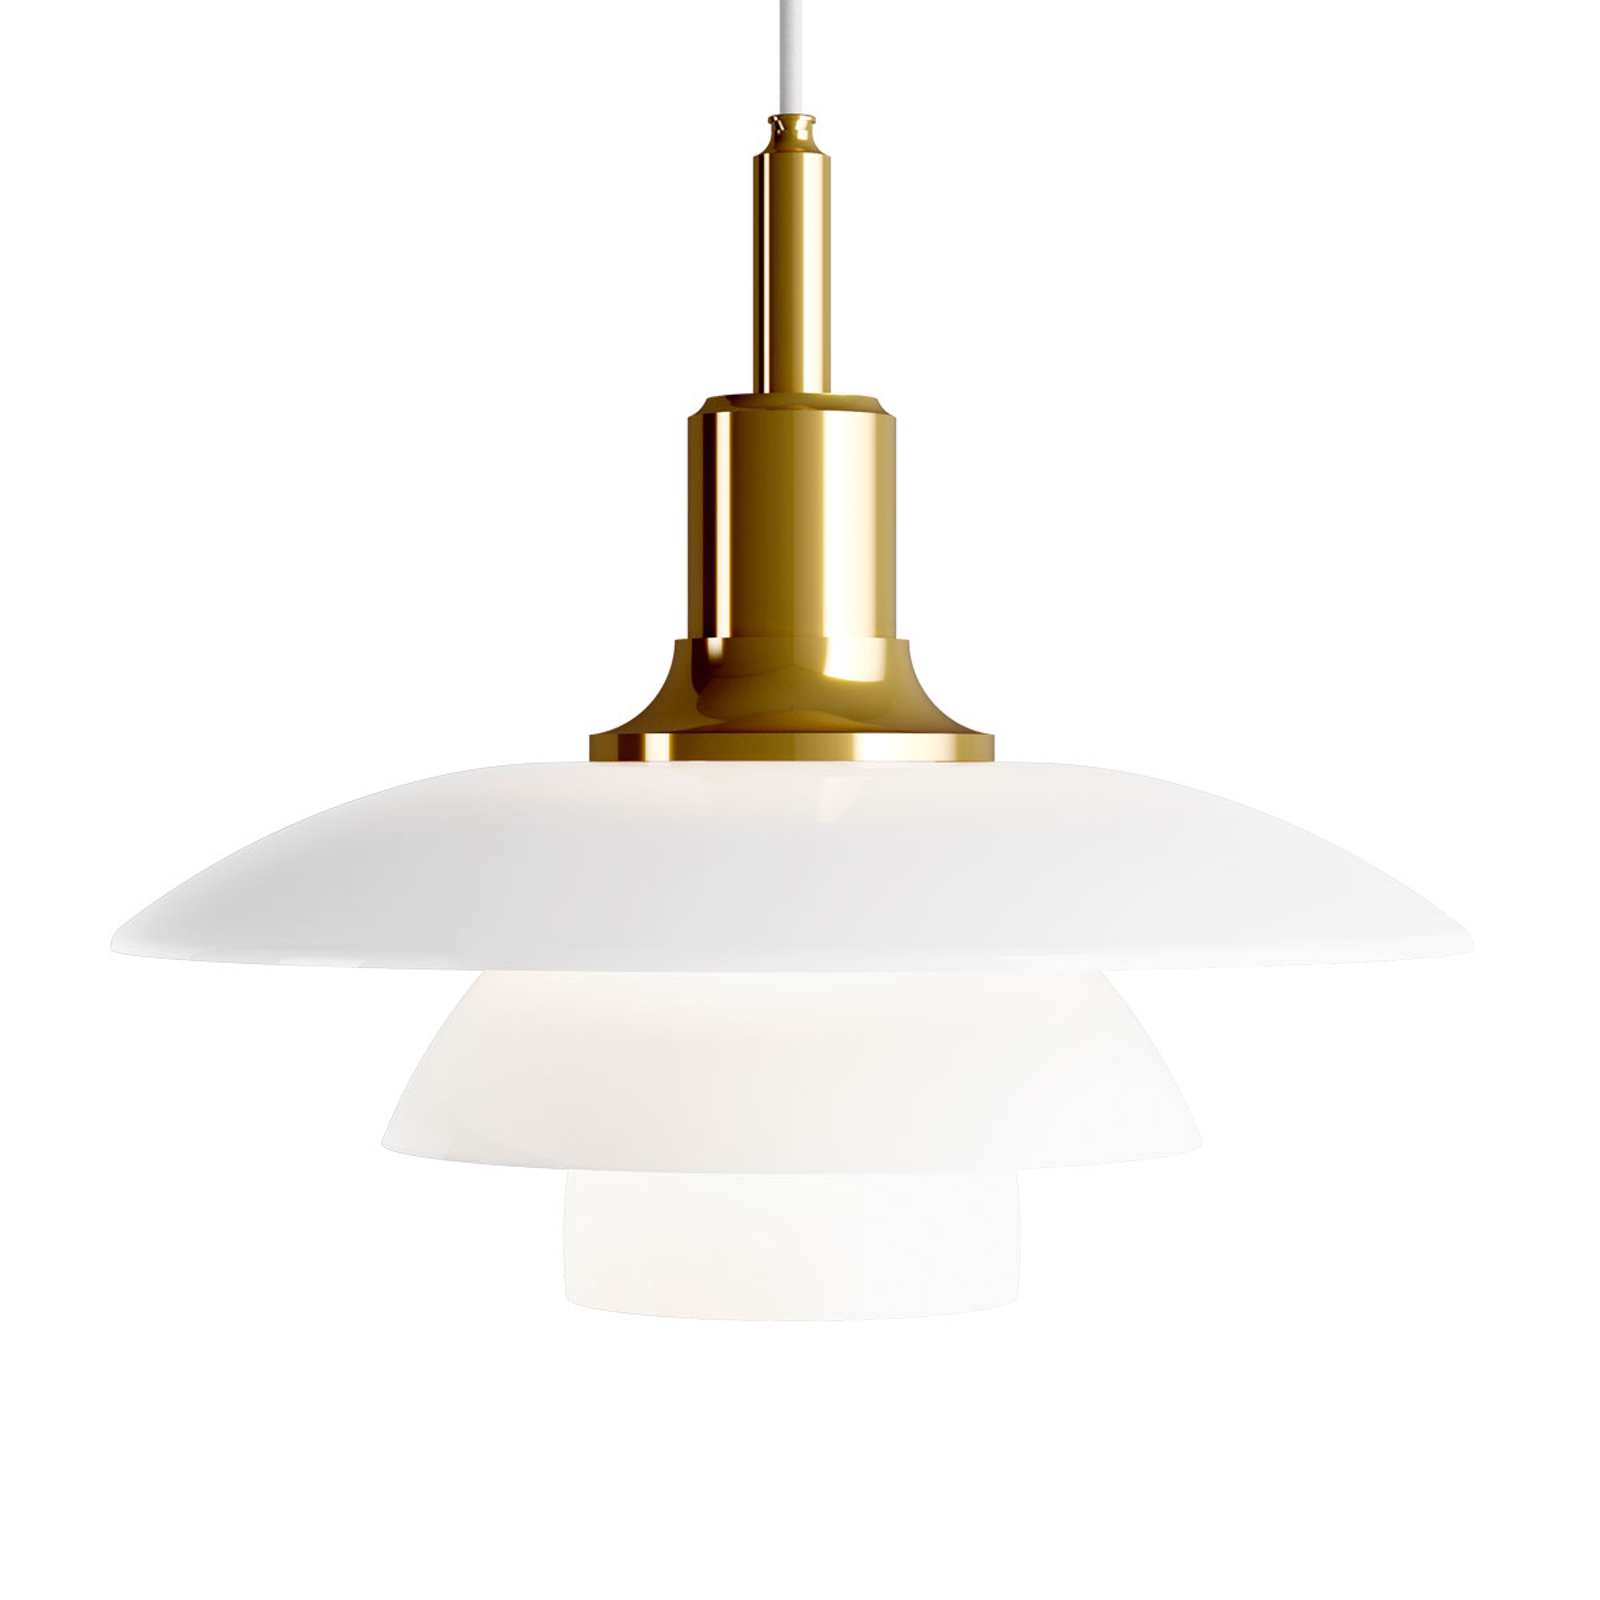 Louis Poulsen PH 3/2 glashængelampe messing-hvid